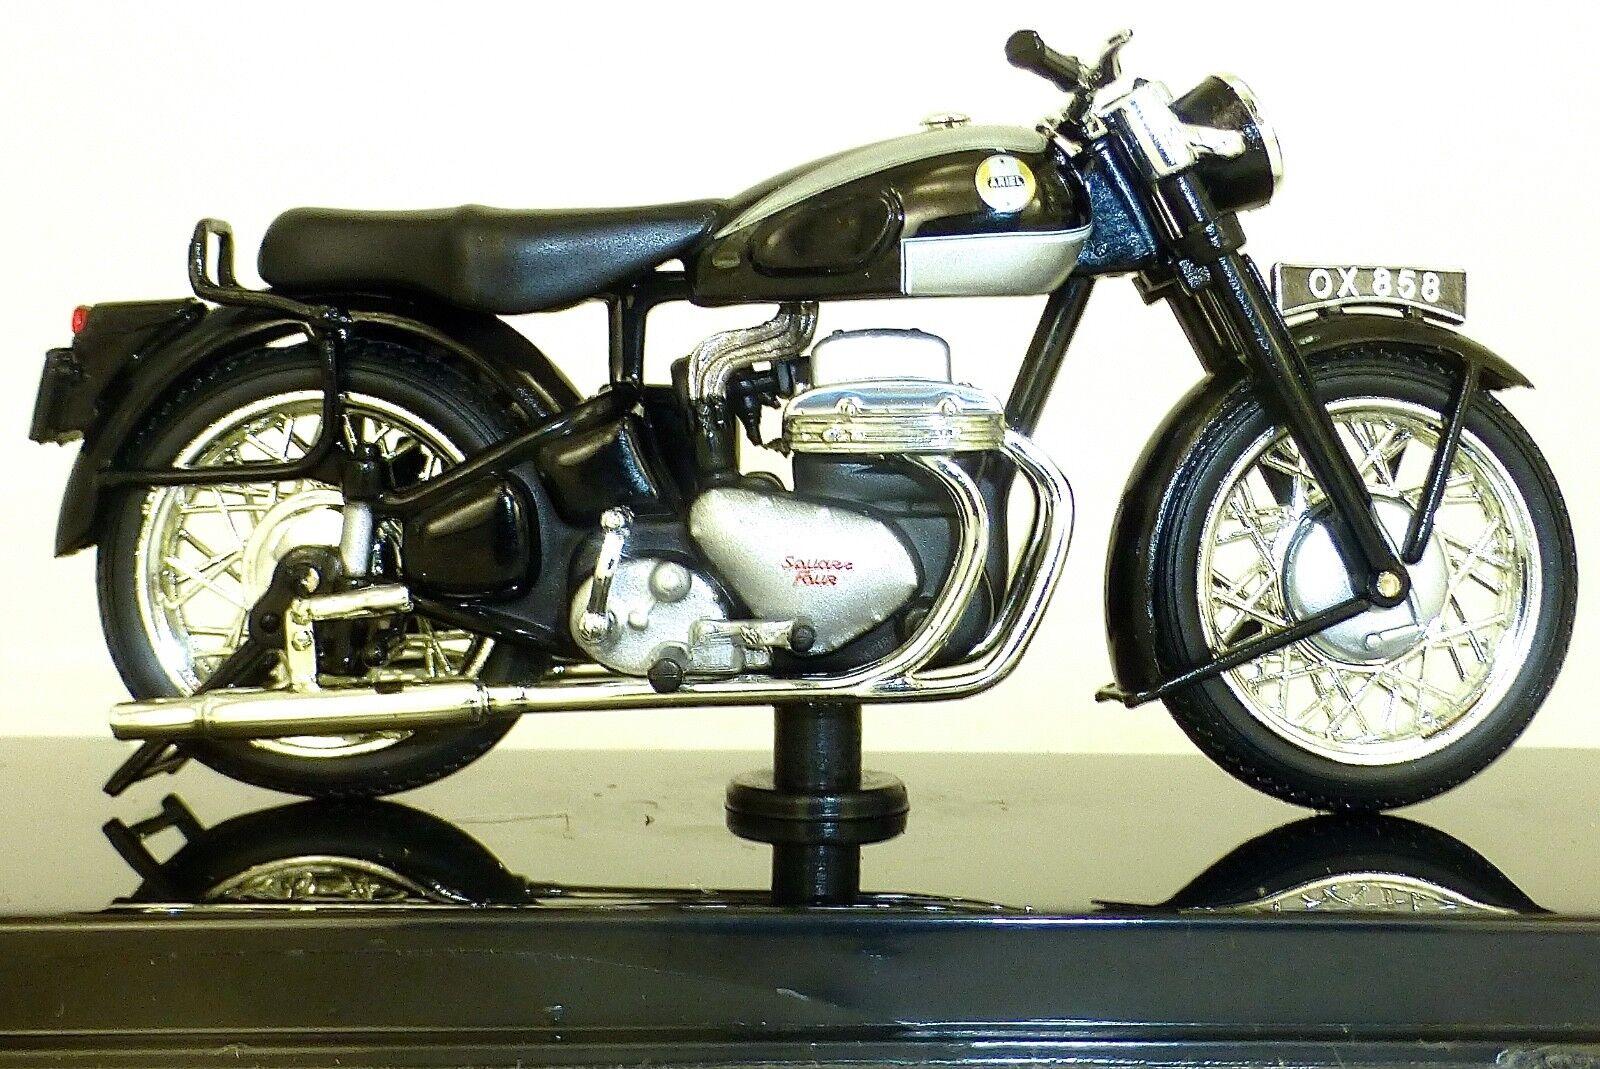 Ariel Square Cuatro 1956 1956 1956 Moto Classic Atlas 4658114 Nuevo 1 24 Emb.orig HC3 Μ a5aa6d